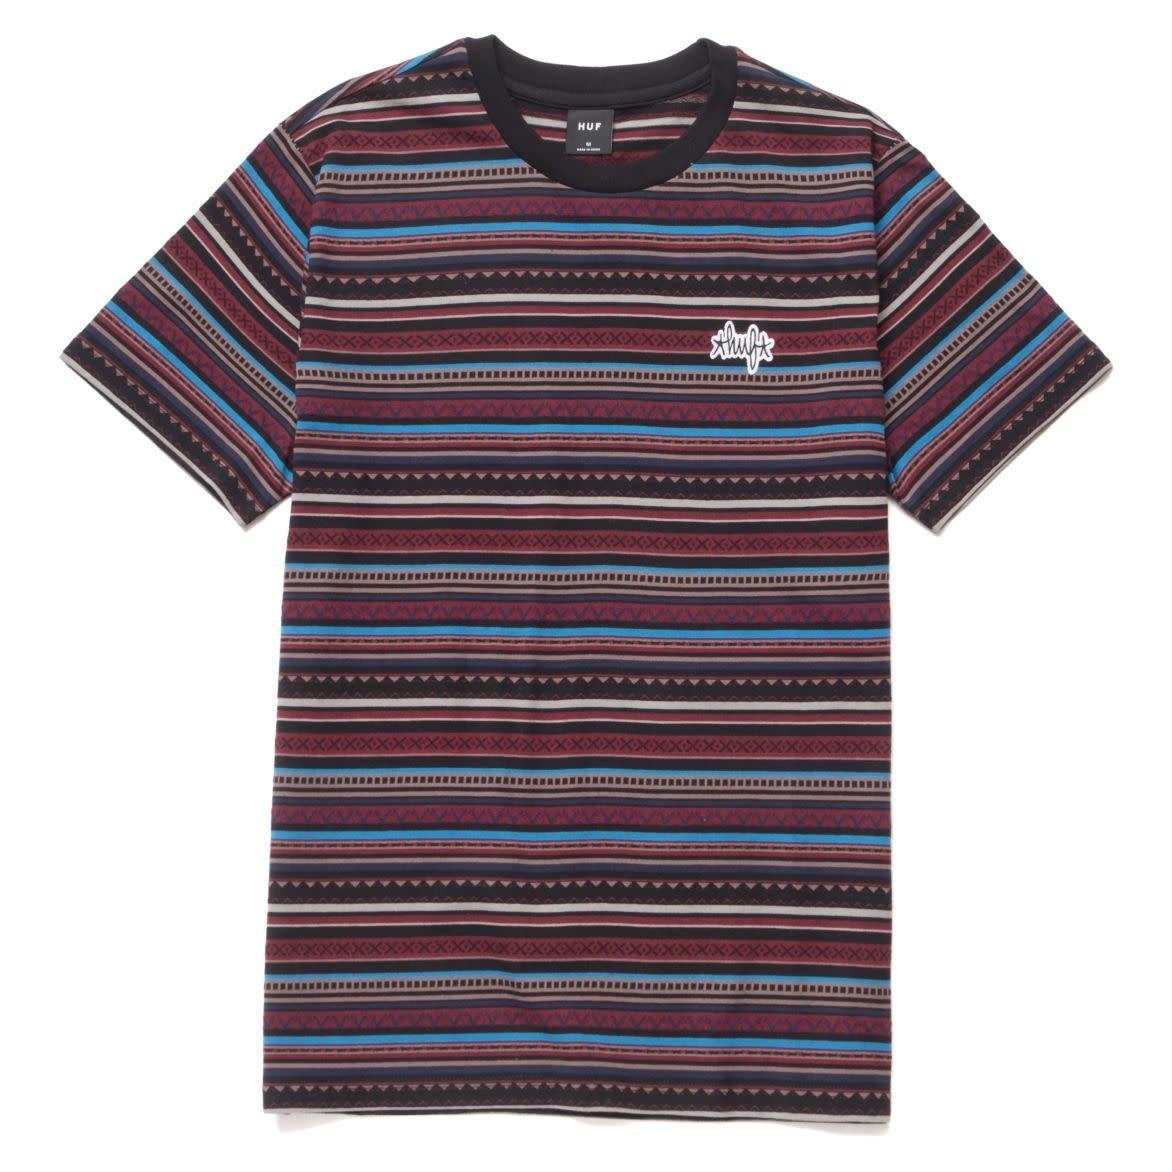 HUF Topanga Knit Navy